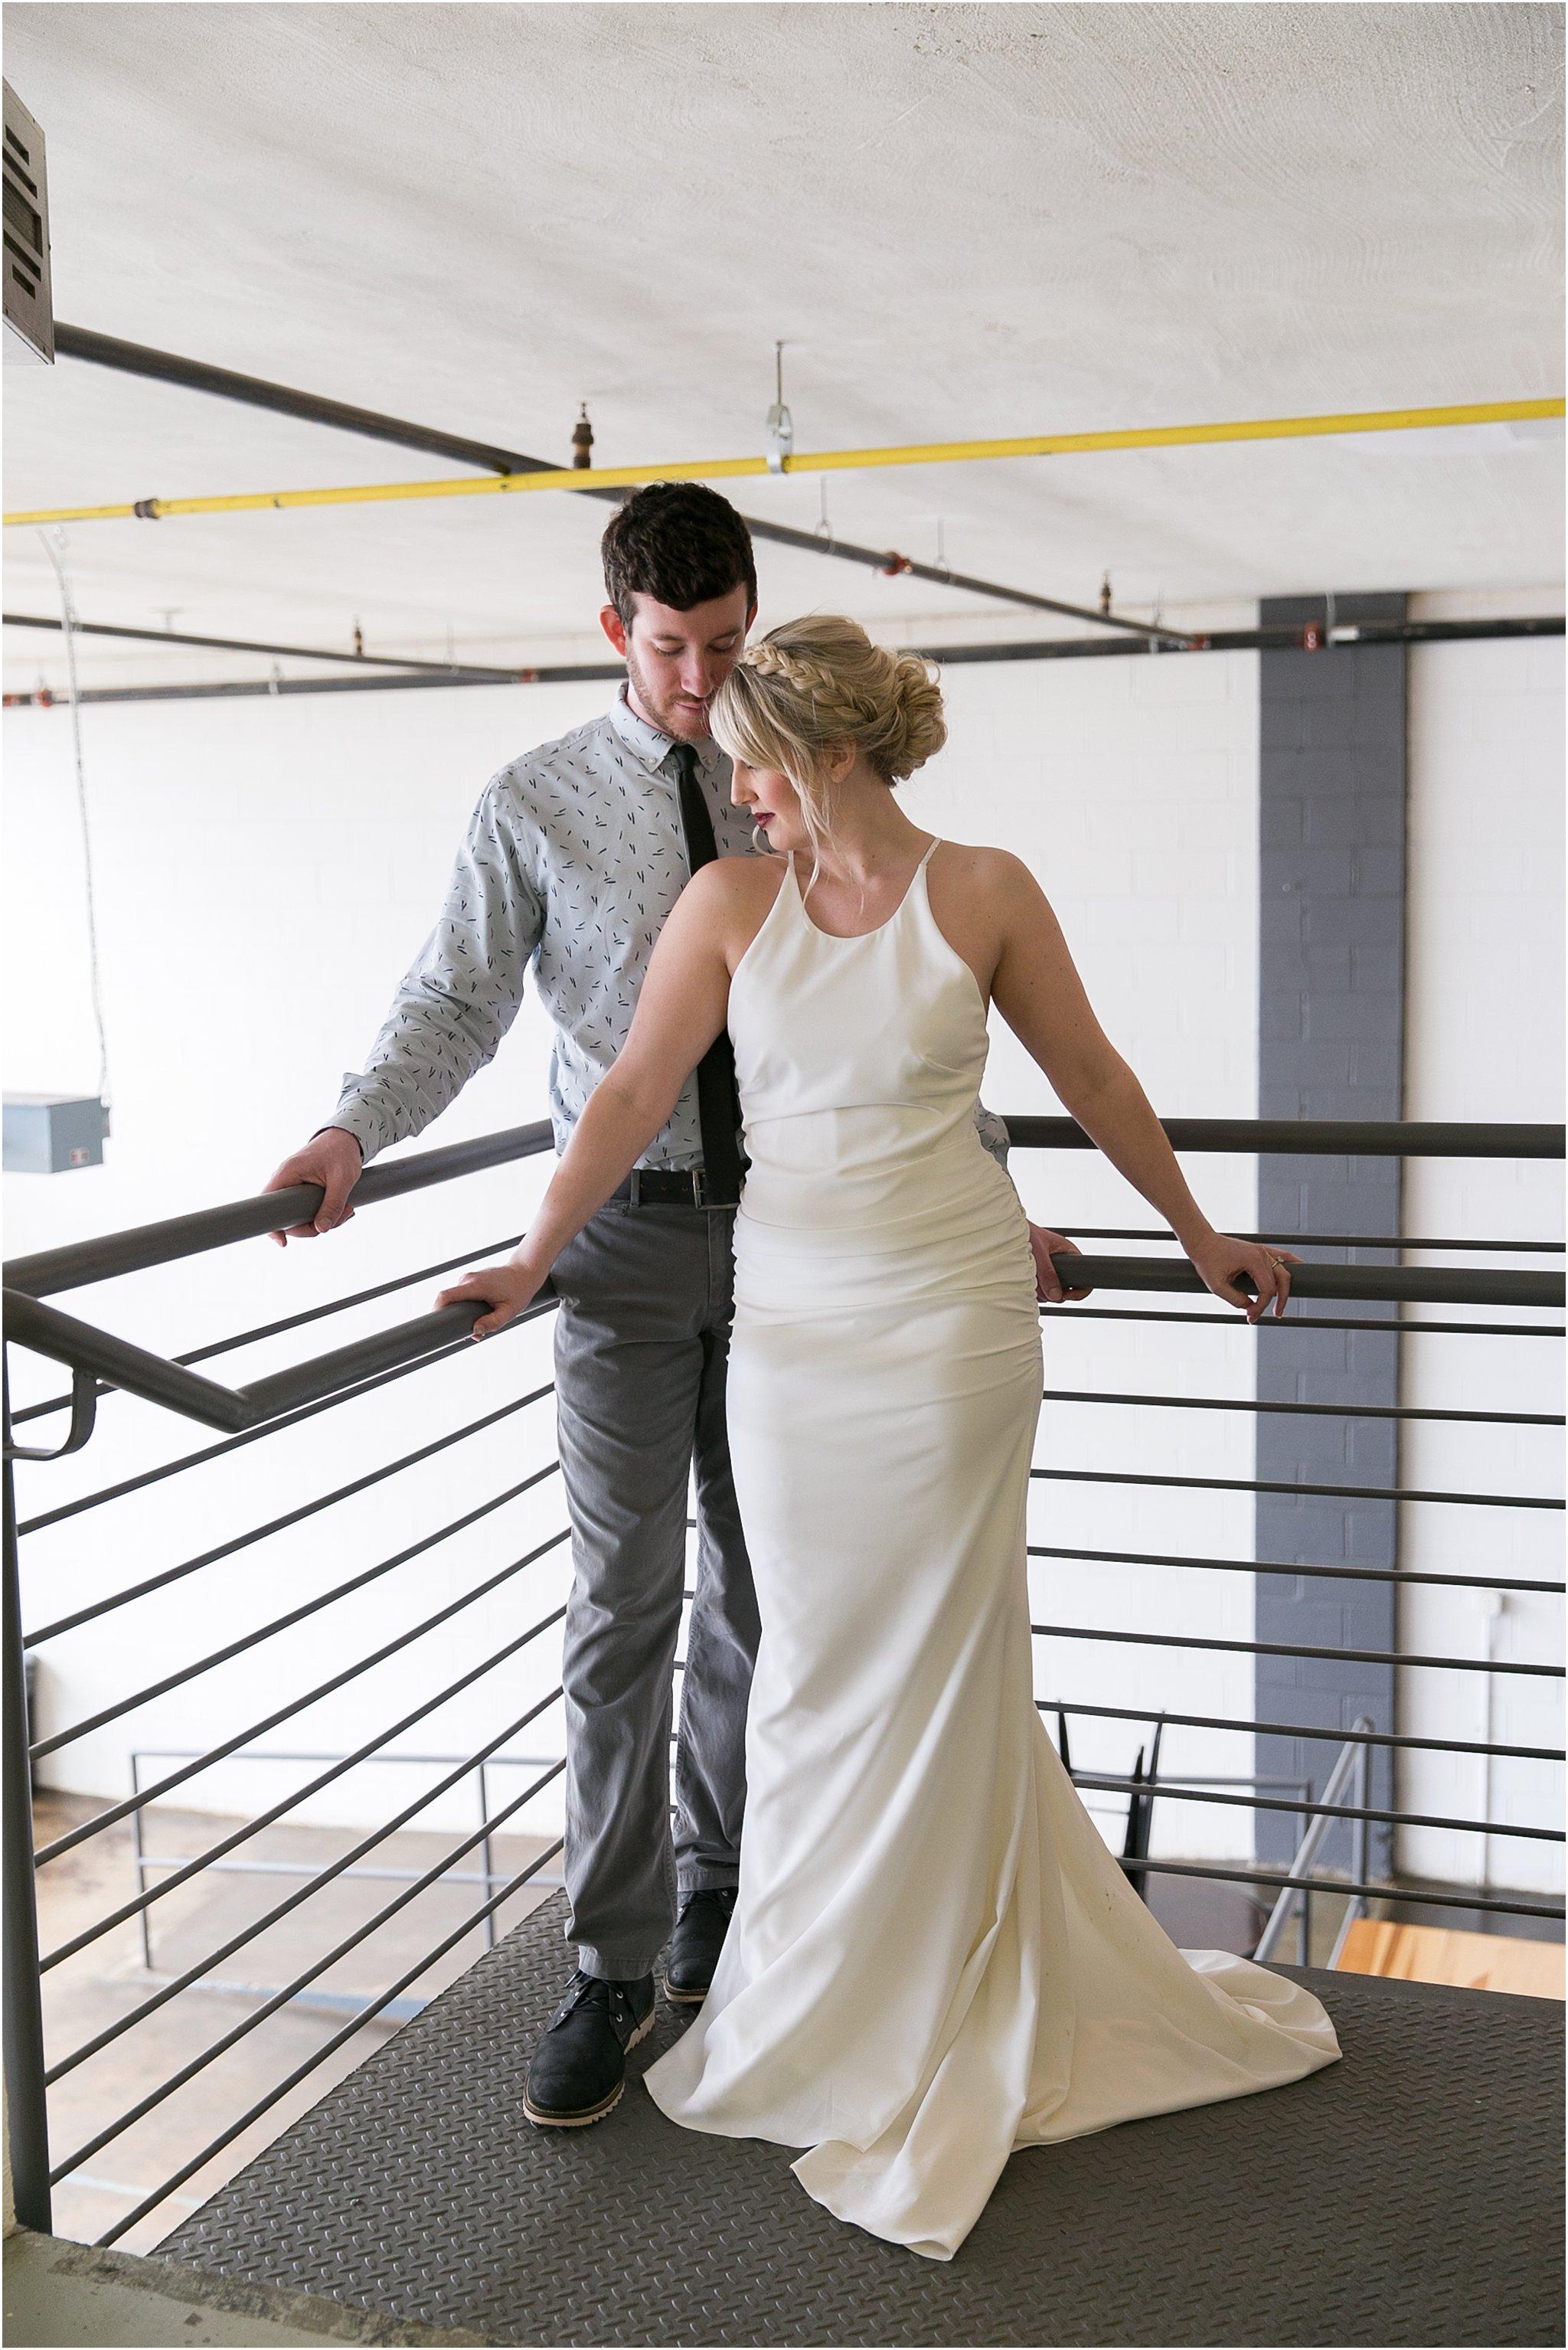 jessica_ryan_photography_oconnor_brewing_wedding_oconnor_brewing_co_norfolk_virginia_roost_flowers_blue_birds_garage__0804